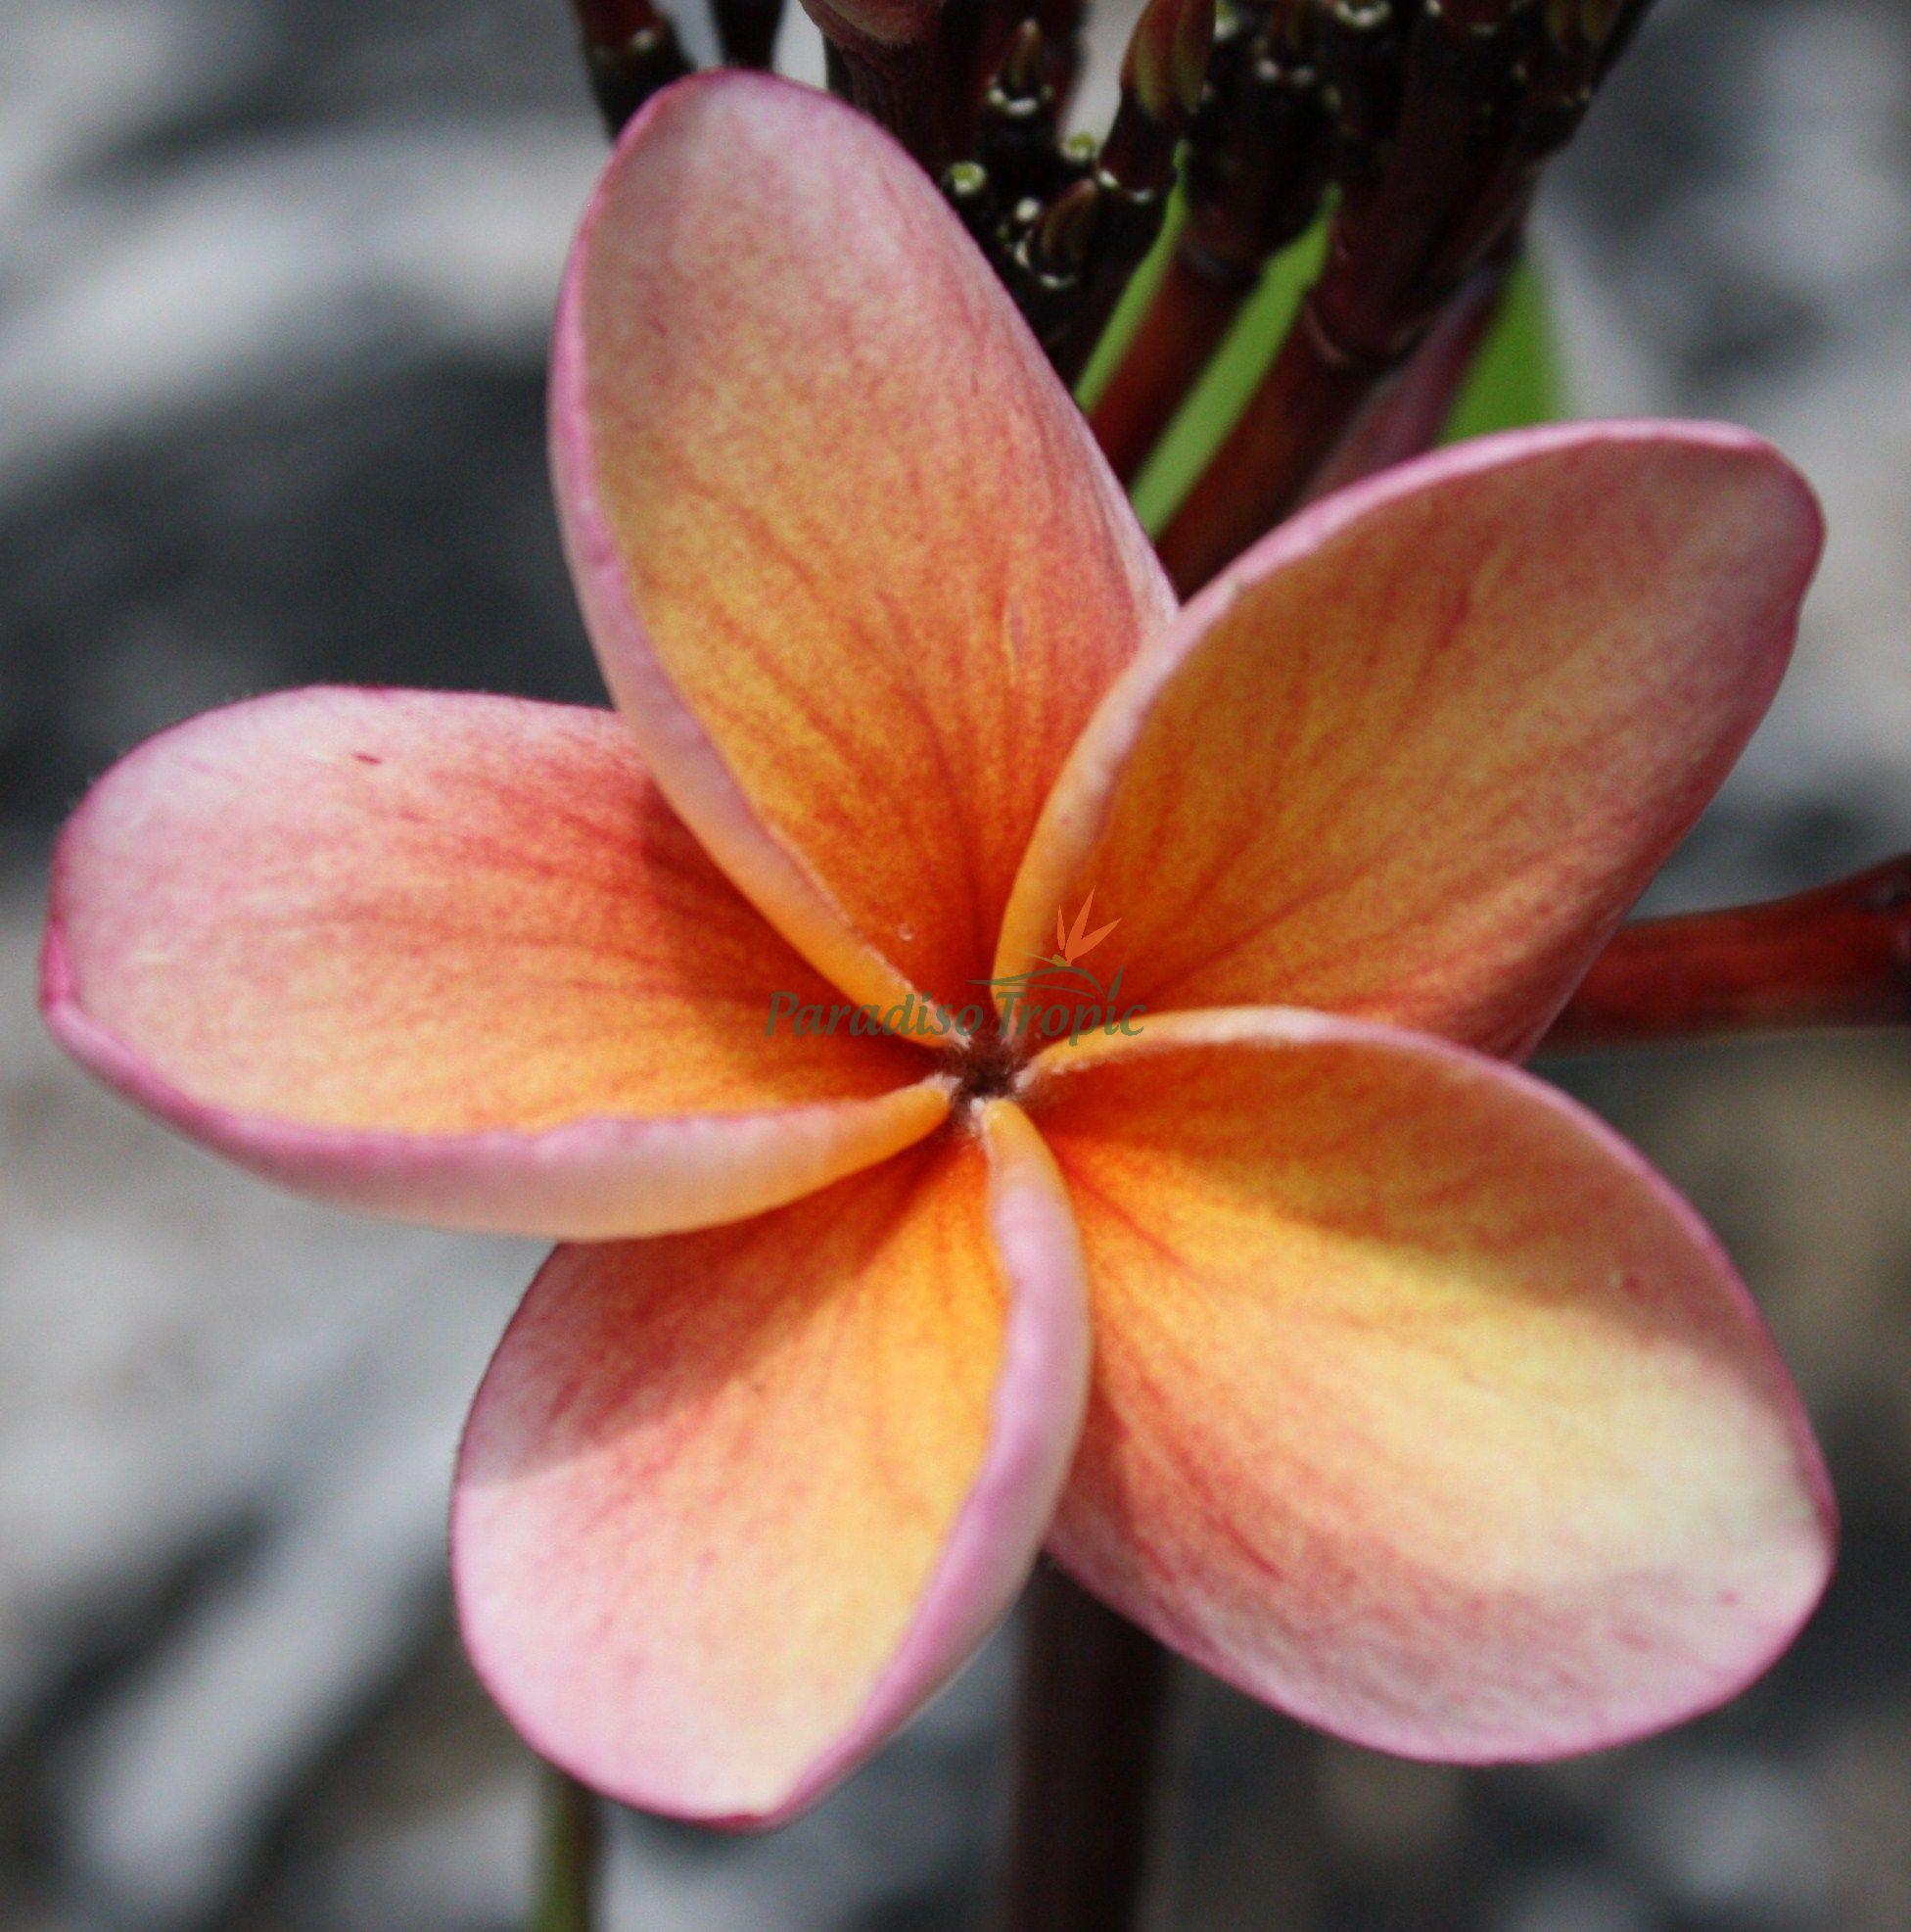 India Plumeria From Paradiso Tropic Nursery Sold For 49 95 Http Paradisotropic Com Plumeria Frangipani Tropical